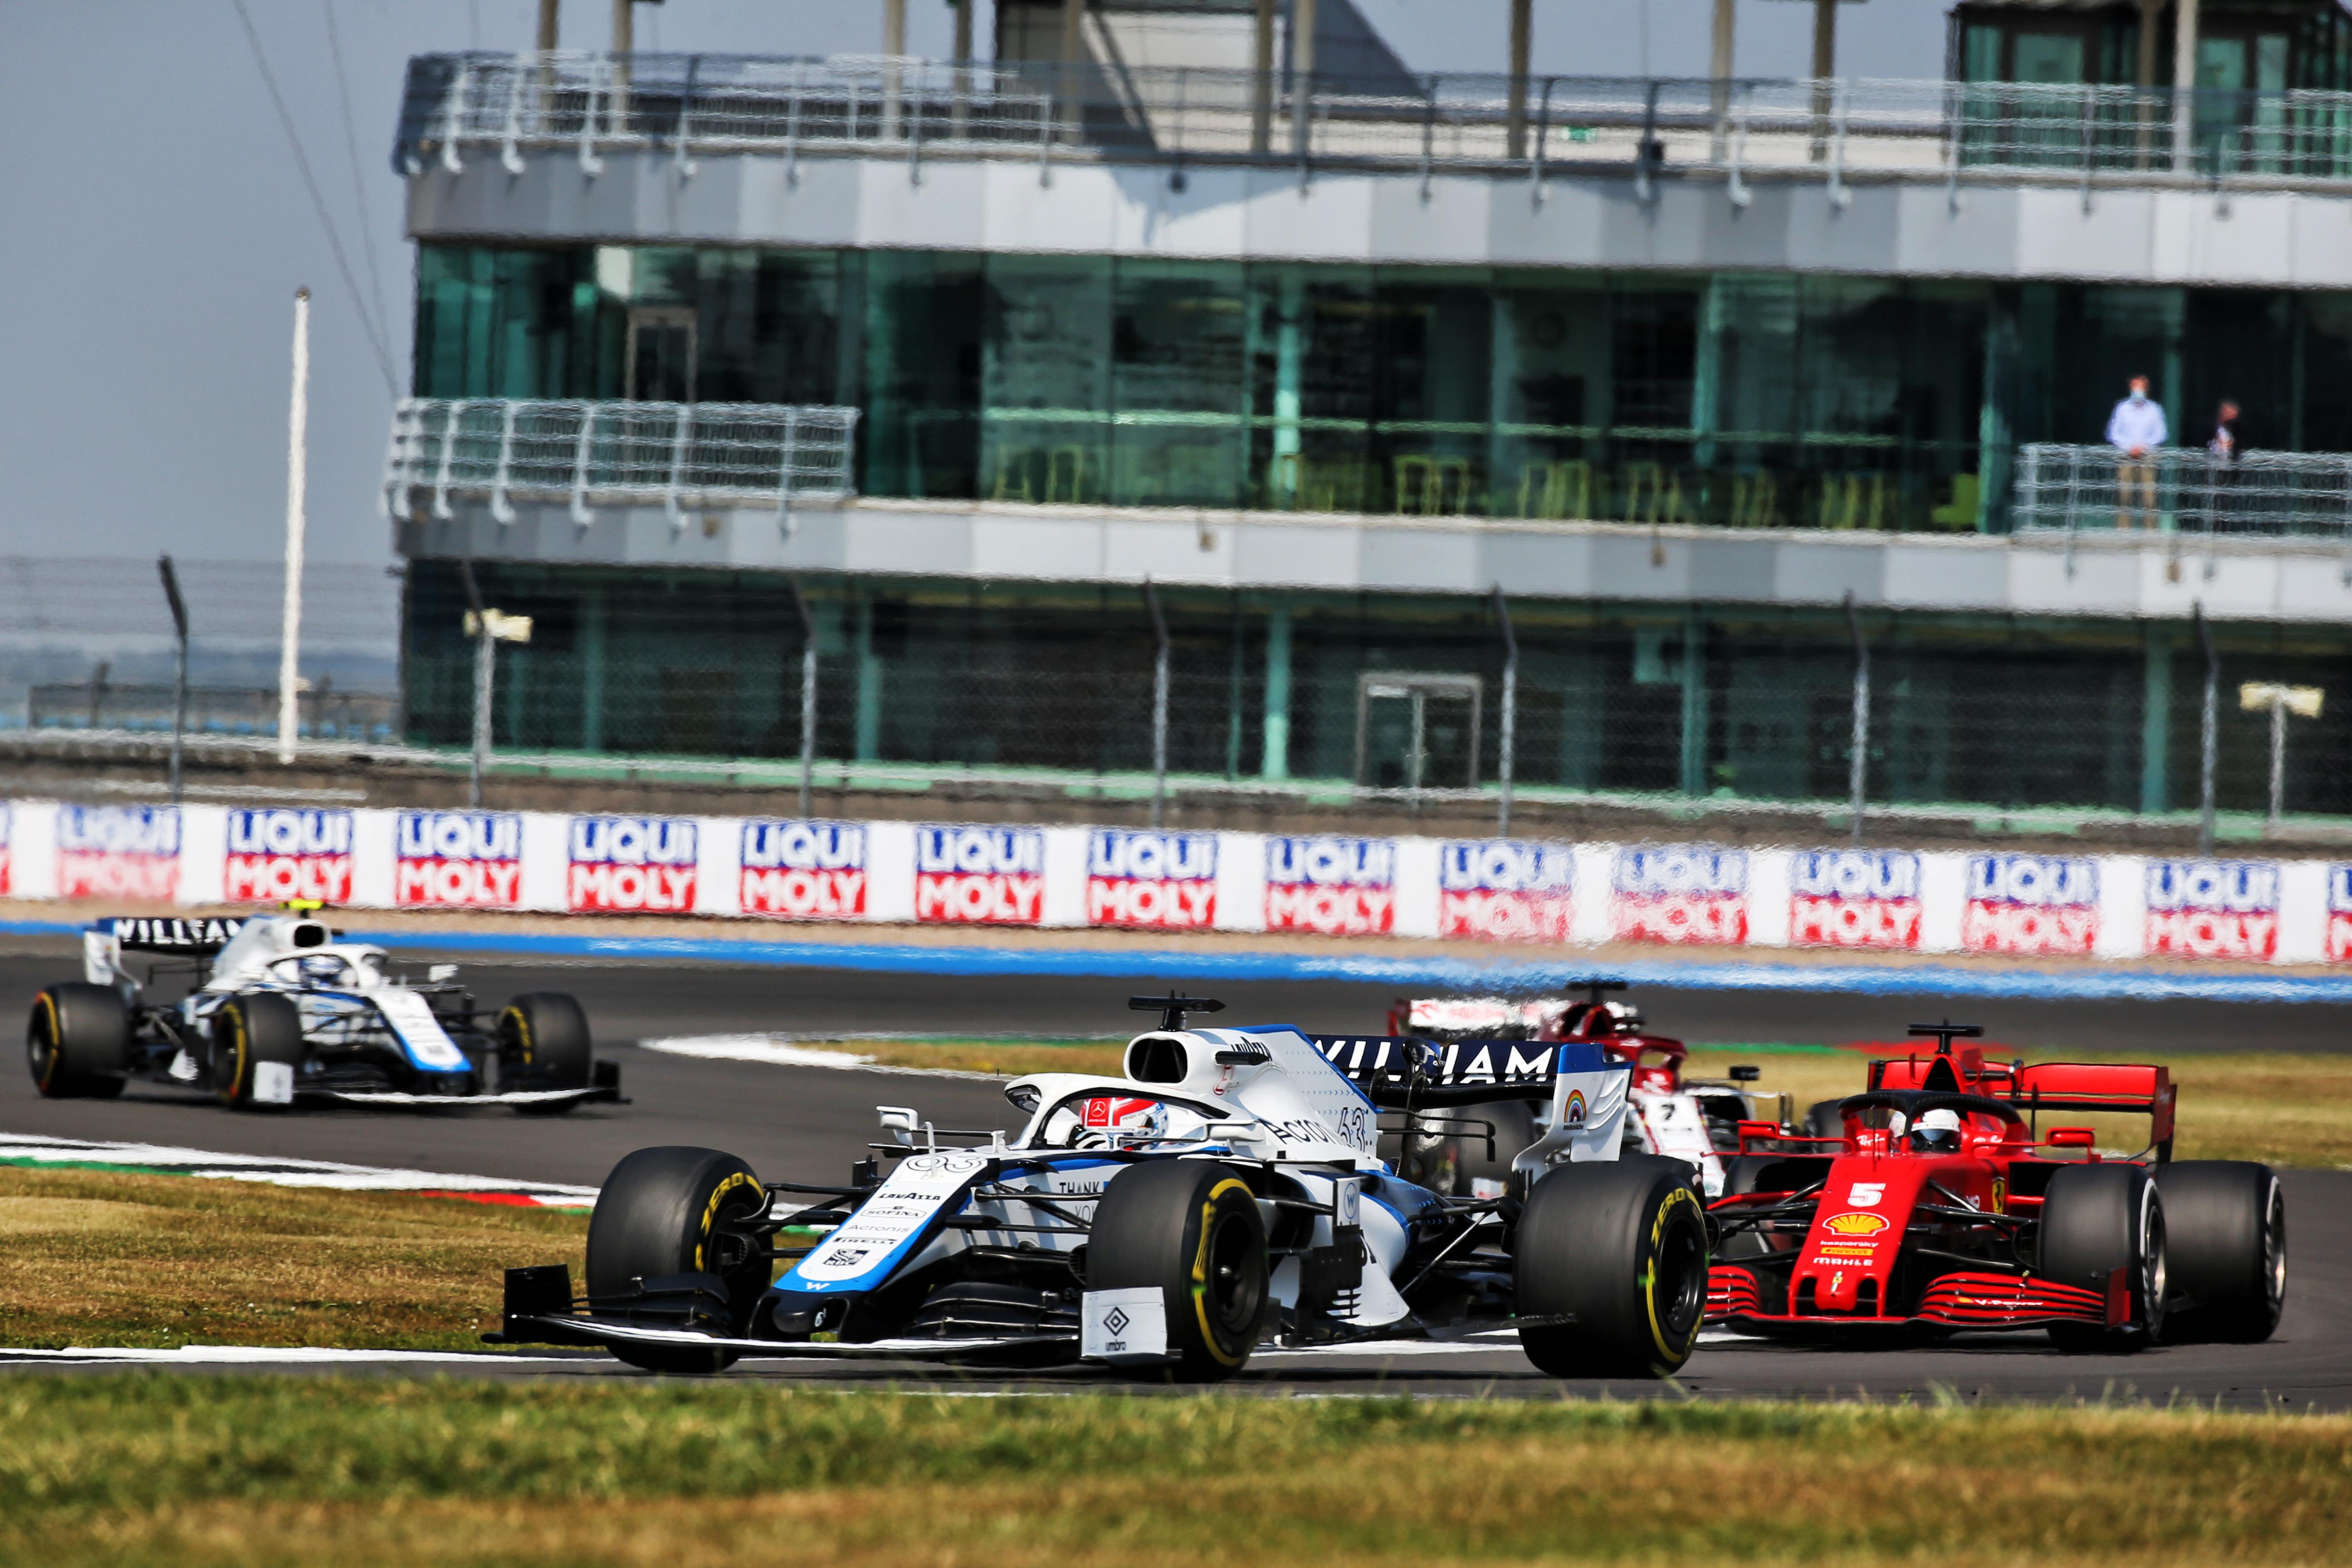 George Russell Sebastian Vettel Williams Ferrari F1 2020 Silverstone British Grand Prix 2020